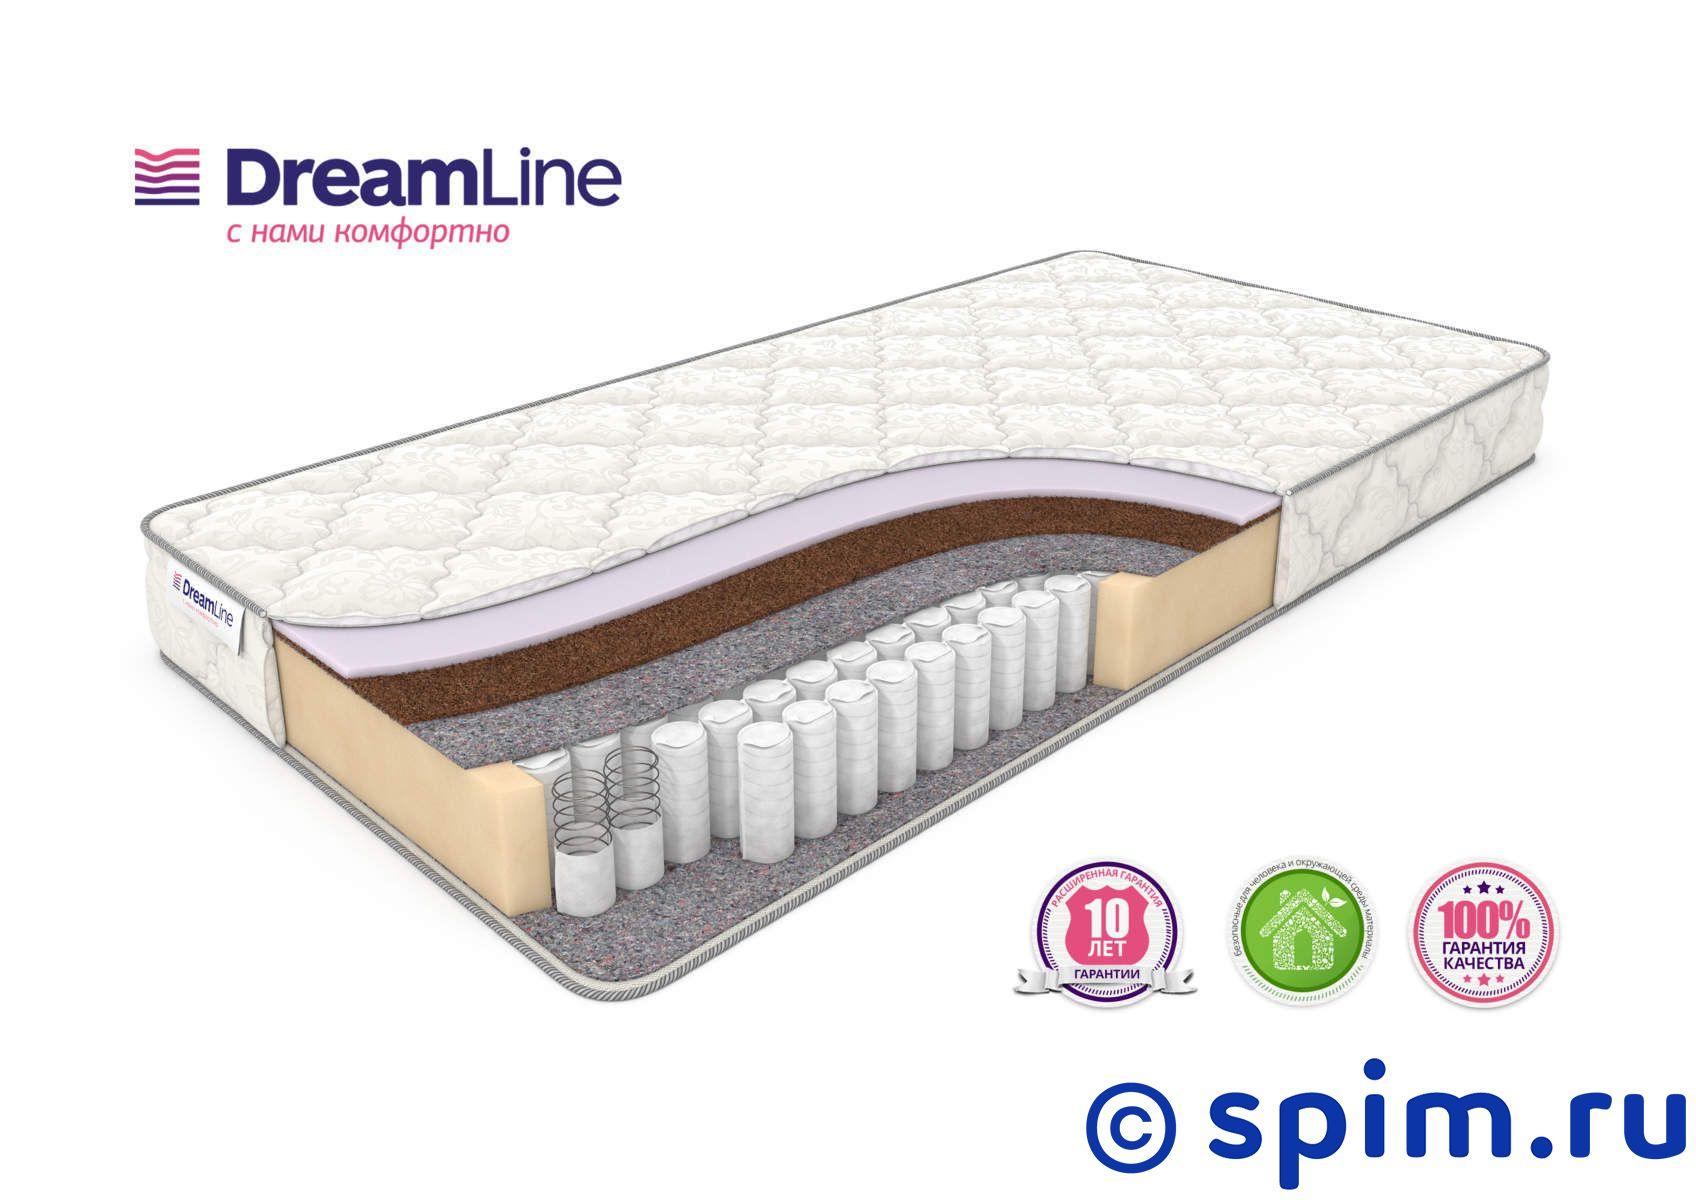 Матрас DreamLine Single Foam Hard Tfk 160х195 см от spim.ru